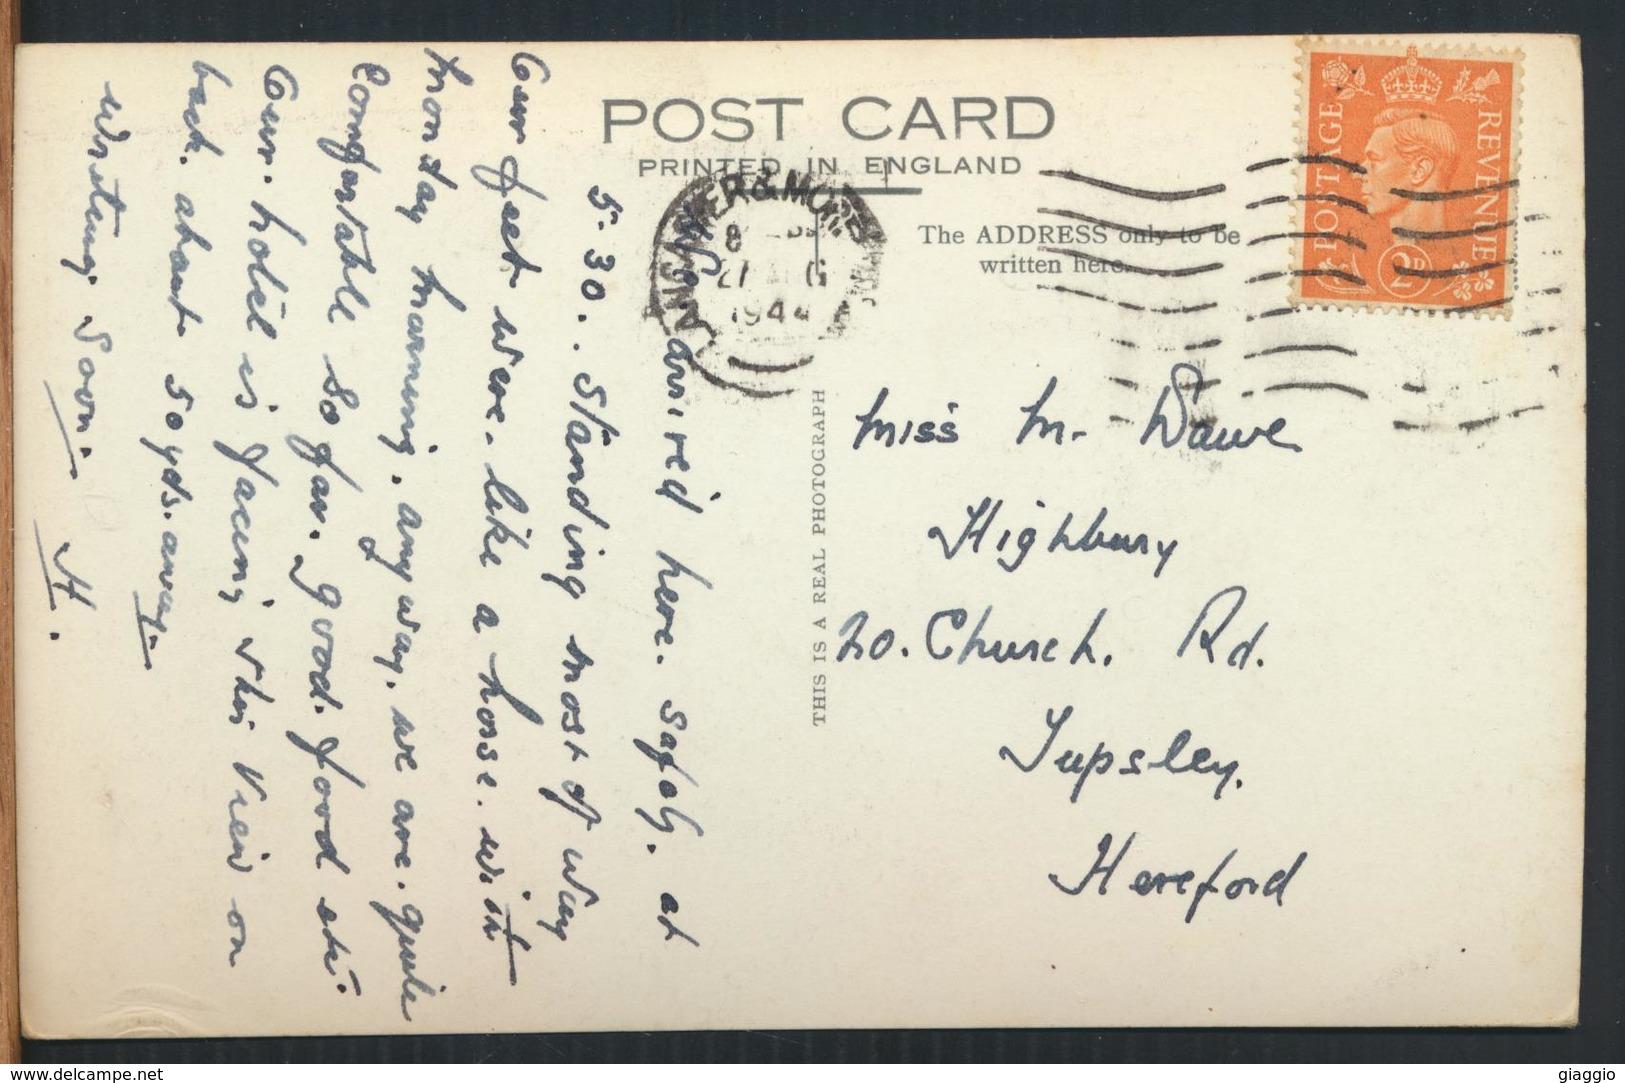 °°° 11931 - UK - ENTRANCE LANCASTER CASTLE - 1944 With Stamps °°° - Altri